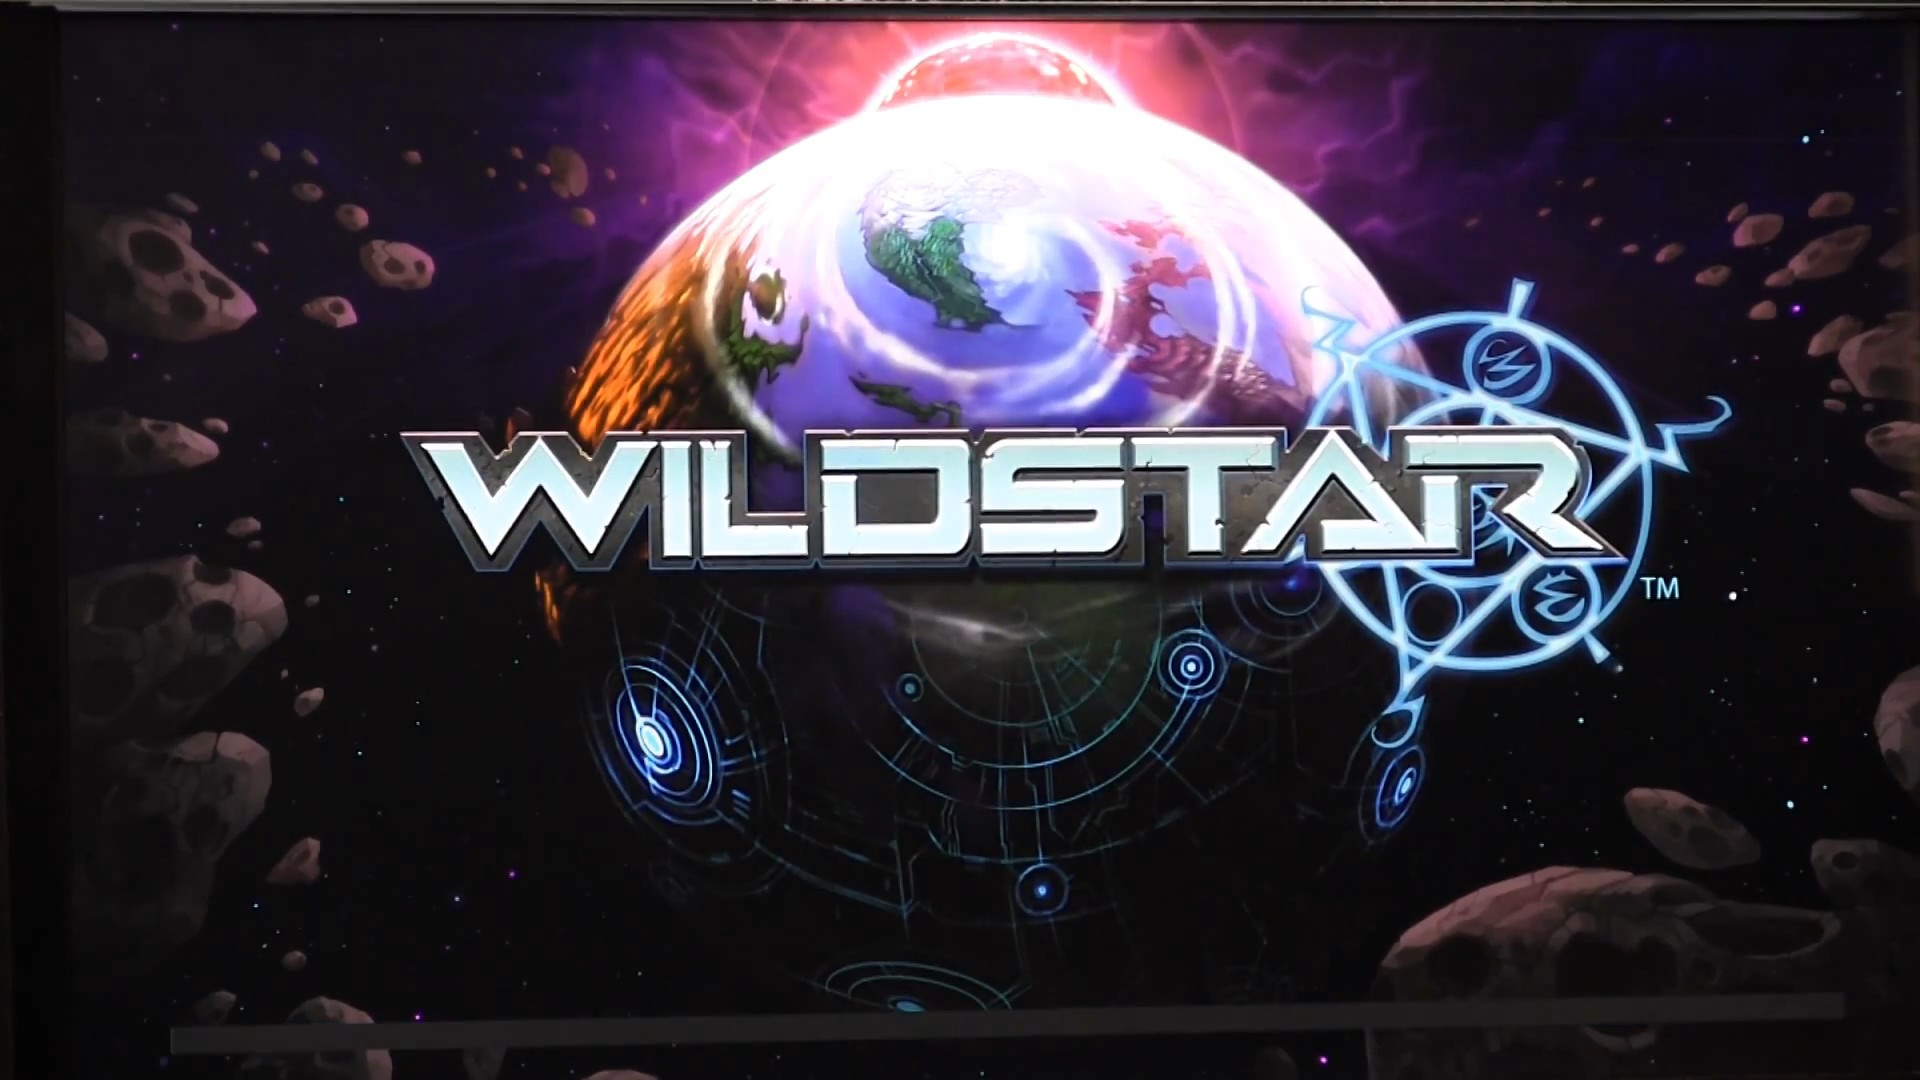 wildstar_background_wallpaper-HD